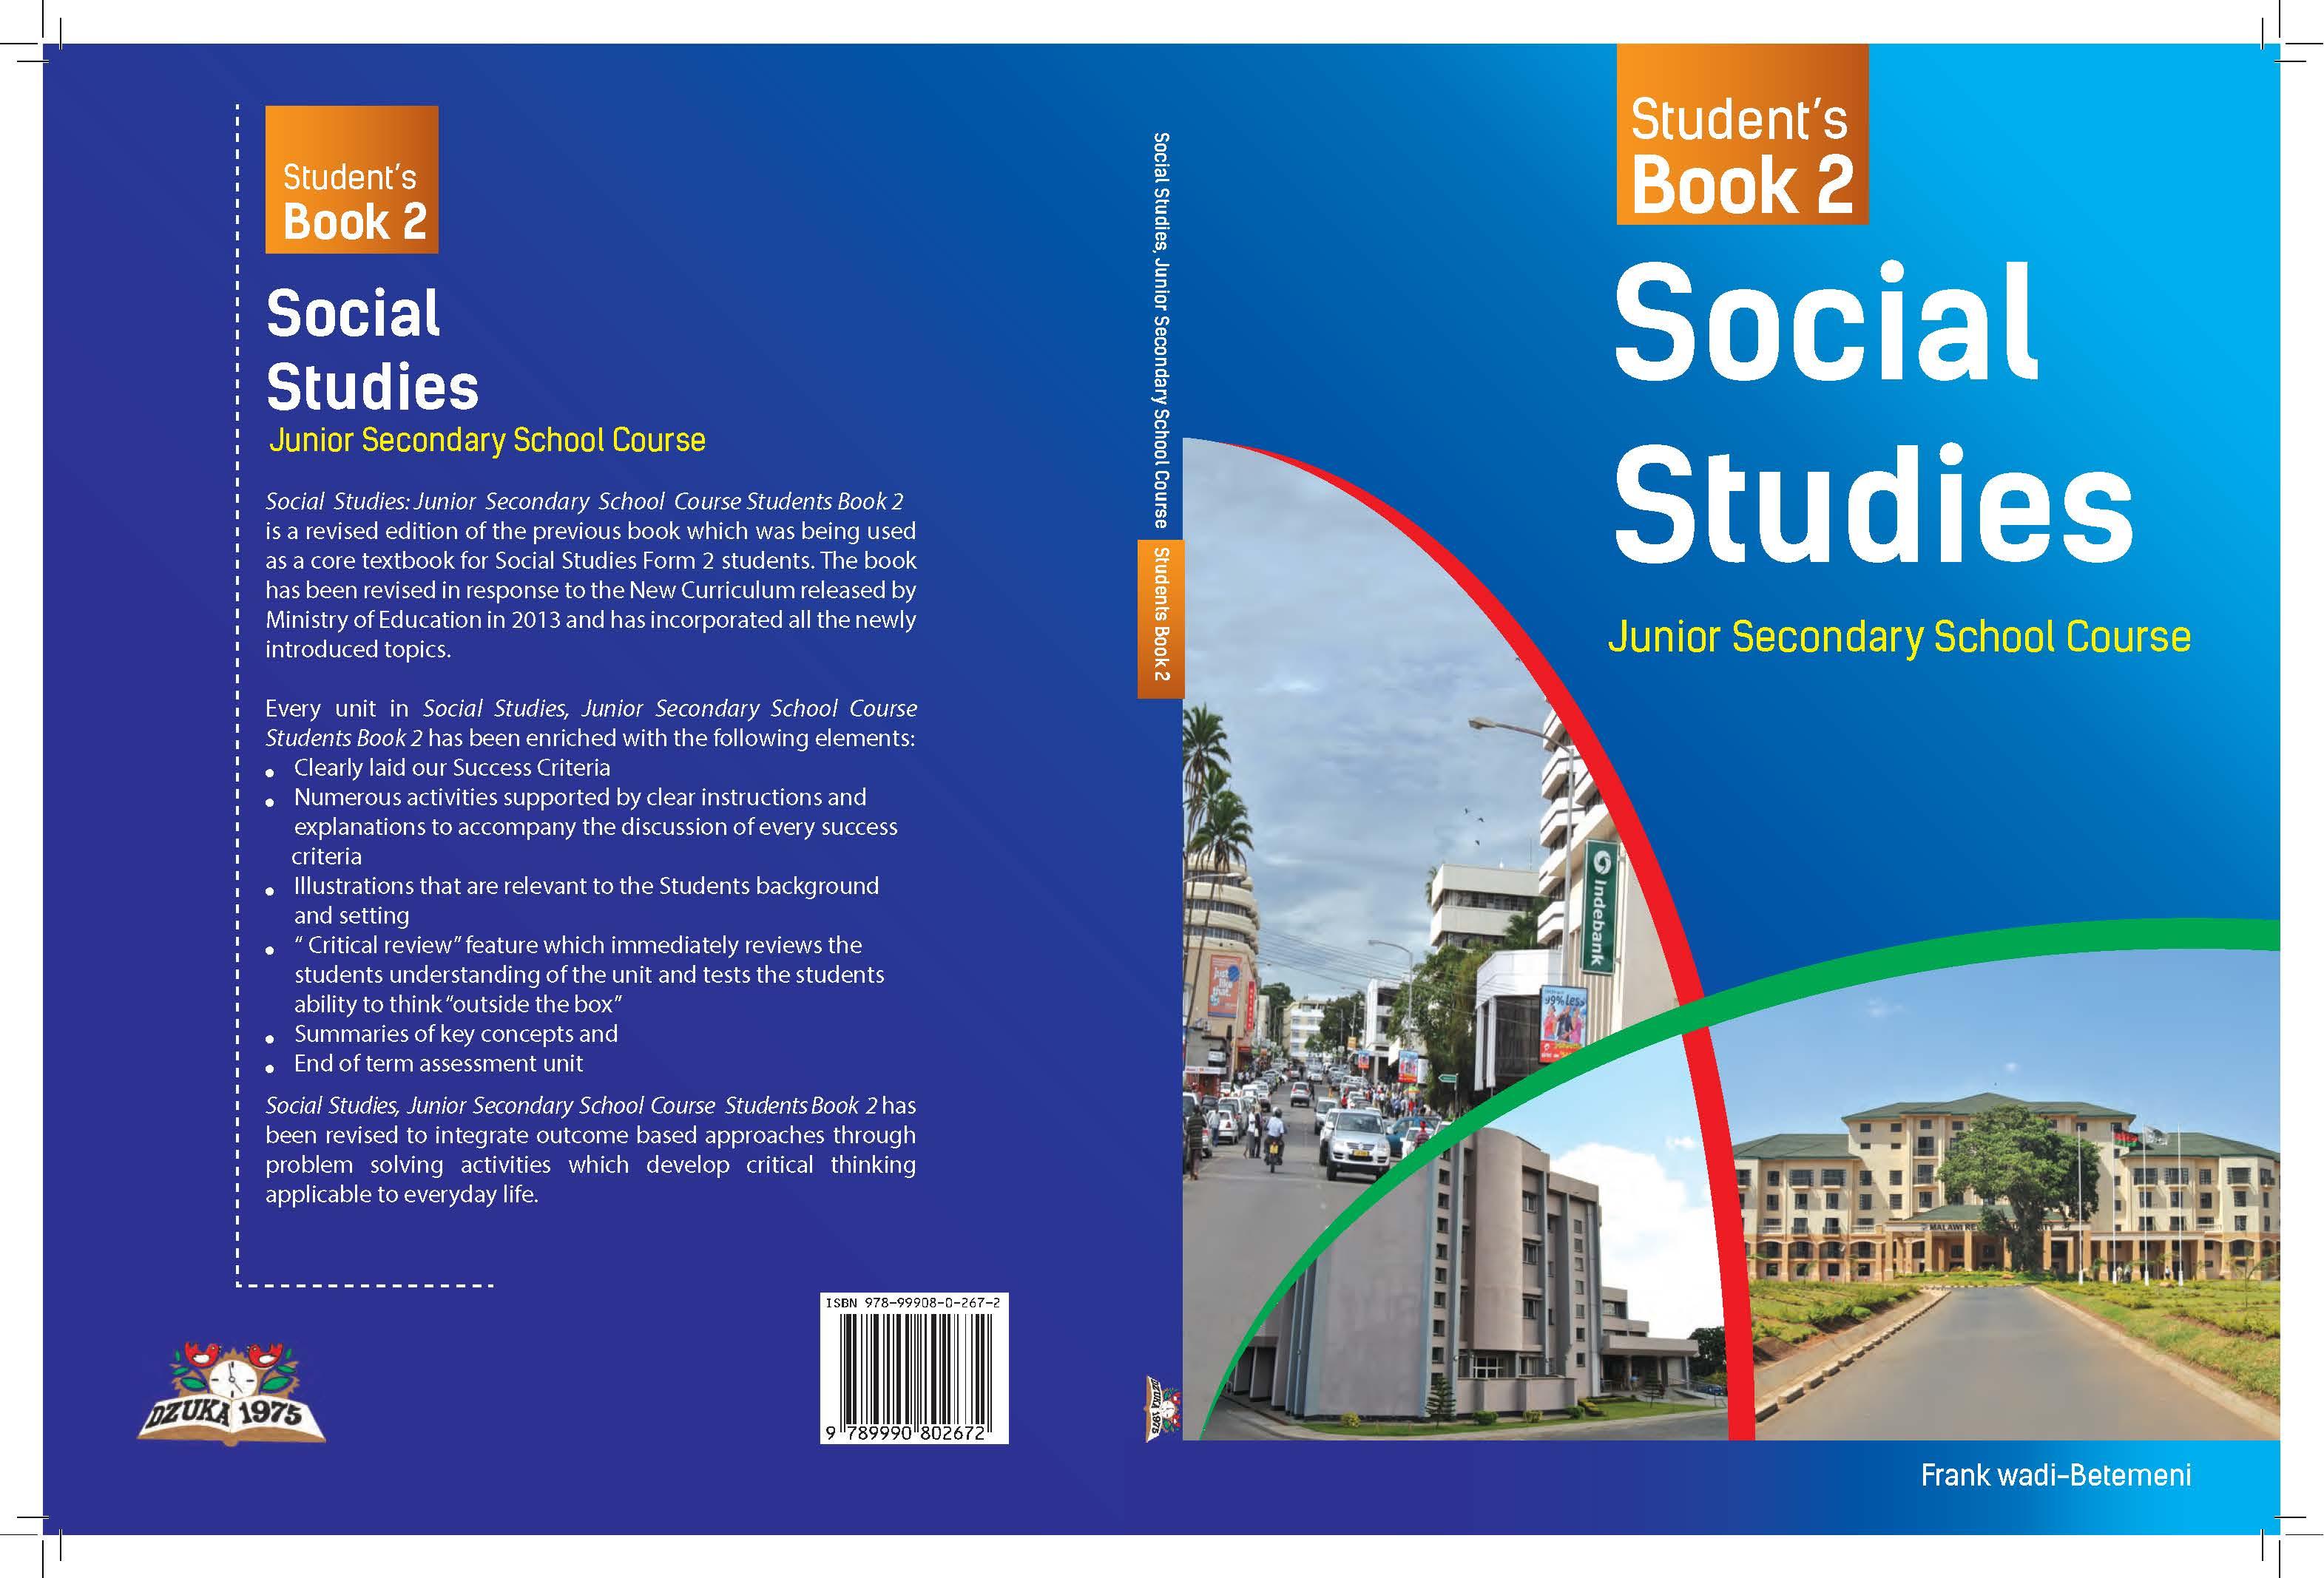 SOCIAL-STUDIES_STUDENTS-BOOK-2-April-23.p1